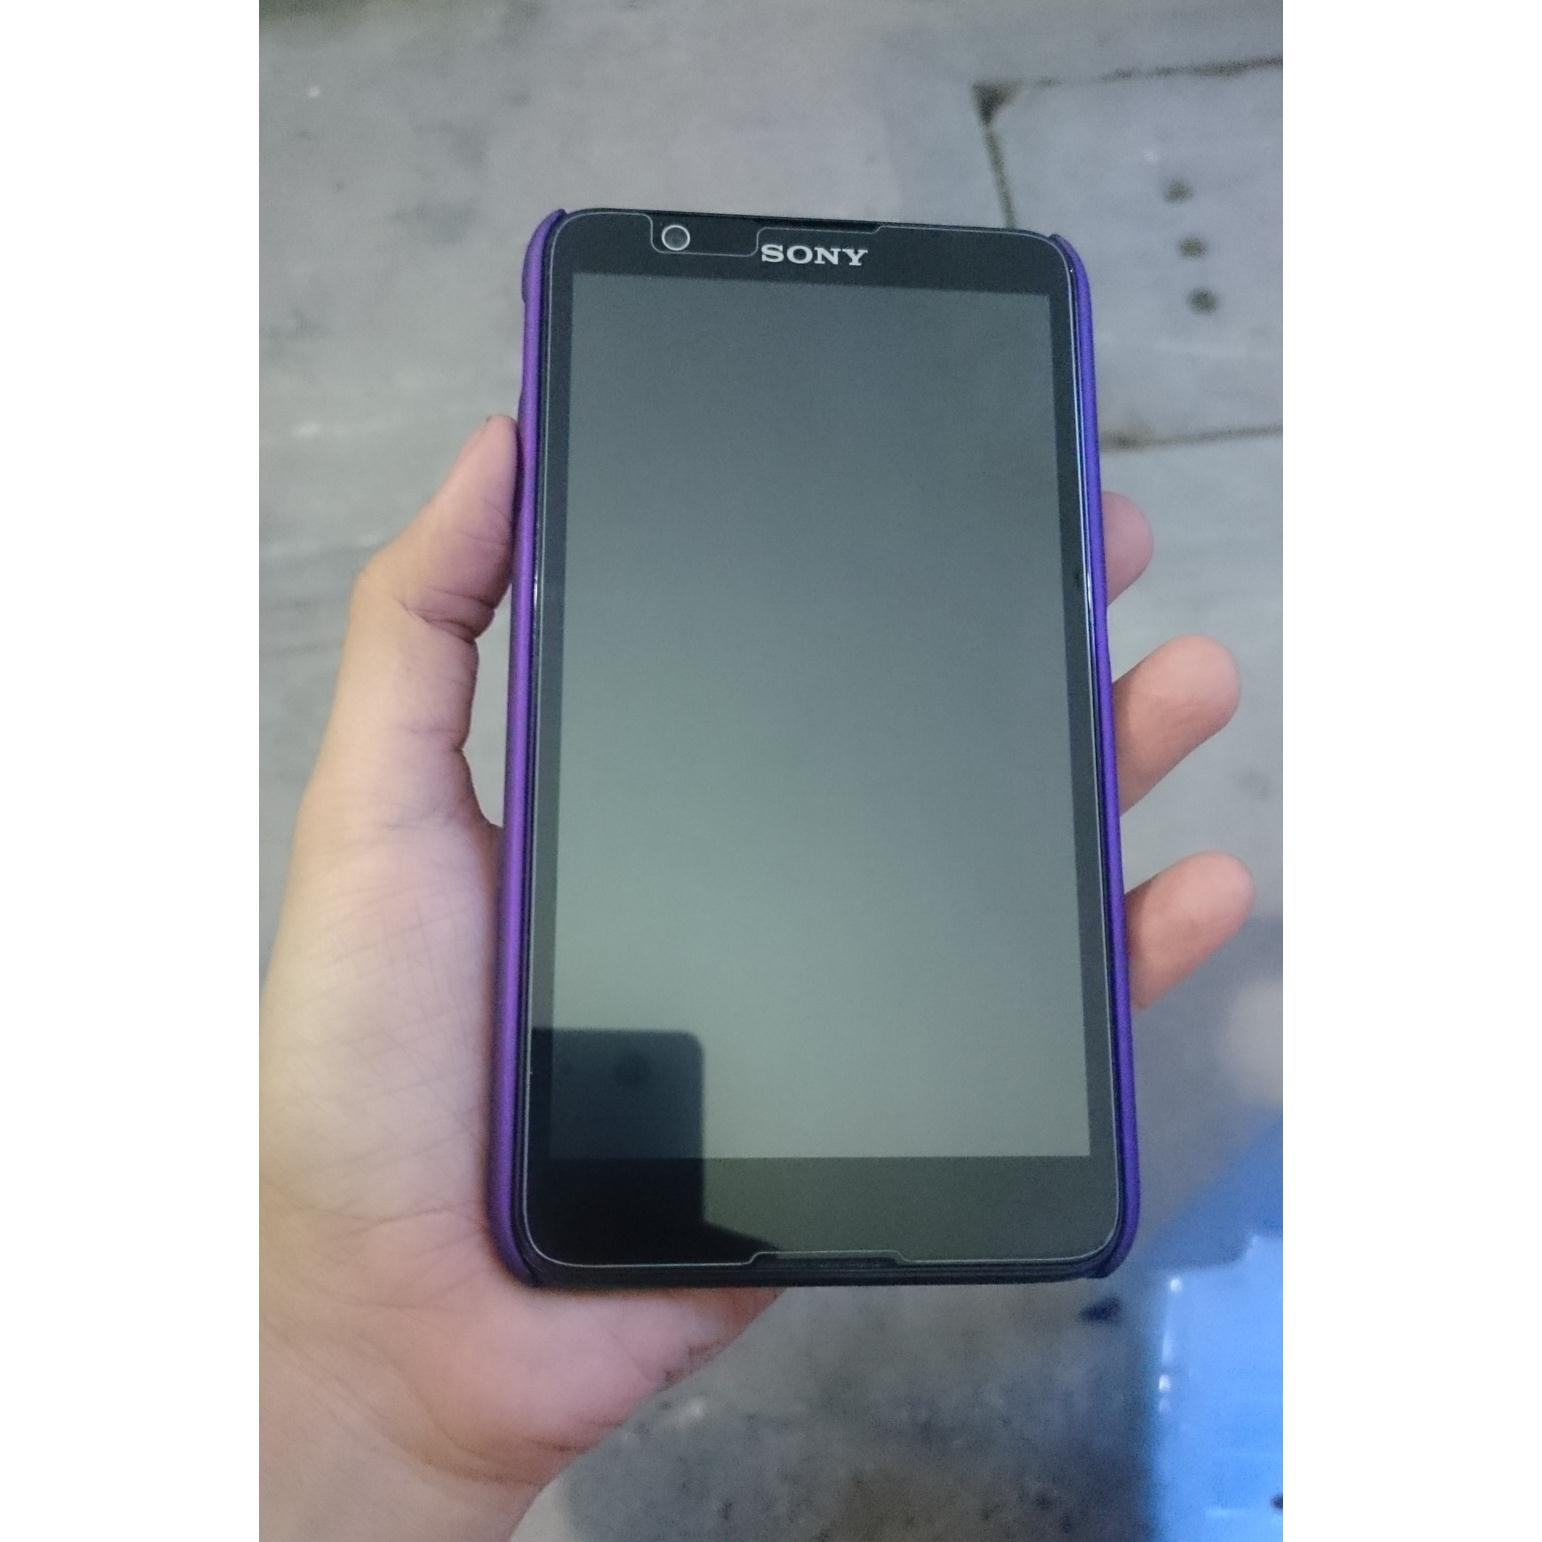 Kính cường lực Sony Xperia E4